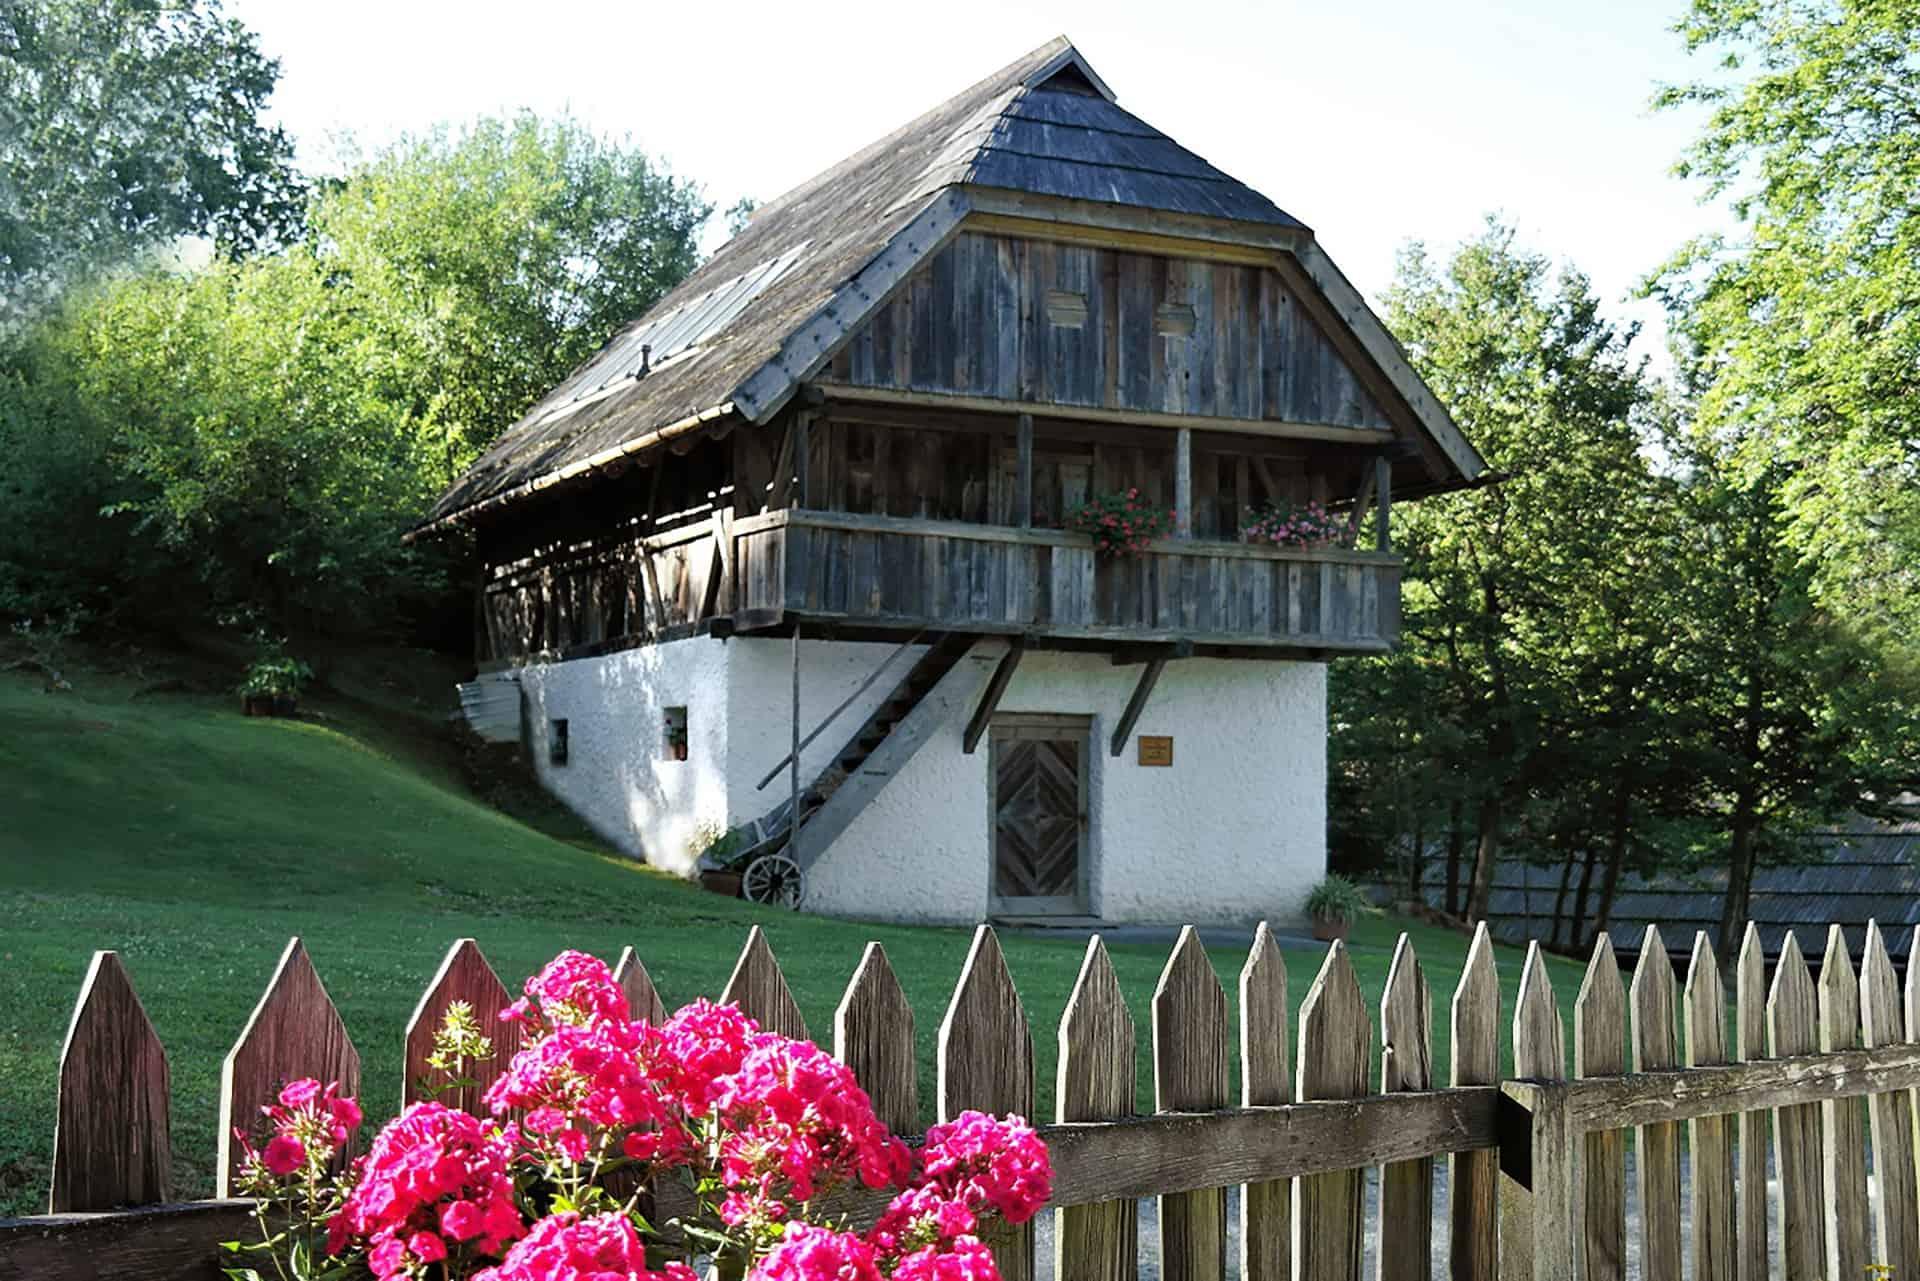 Geöffnetes Kärntner Freilichtmuseum in Maria Saal Nähe Klagenfurt